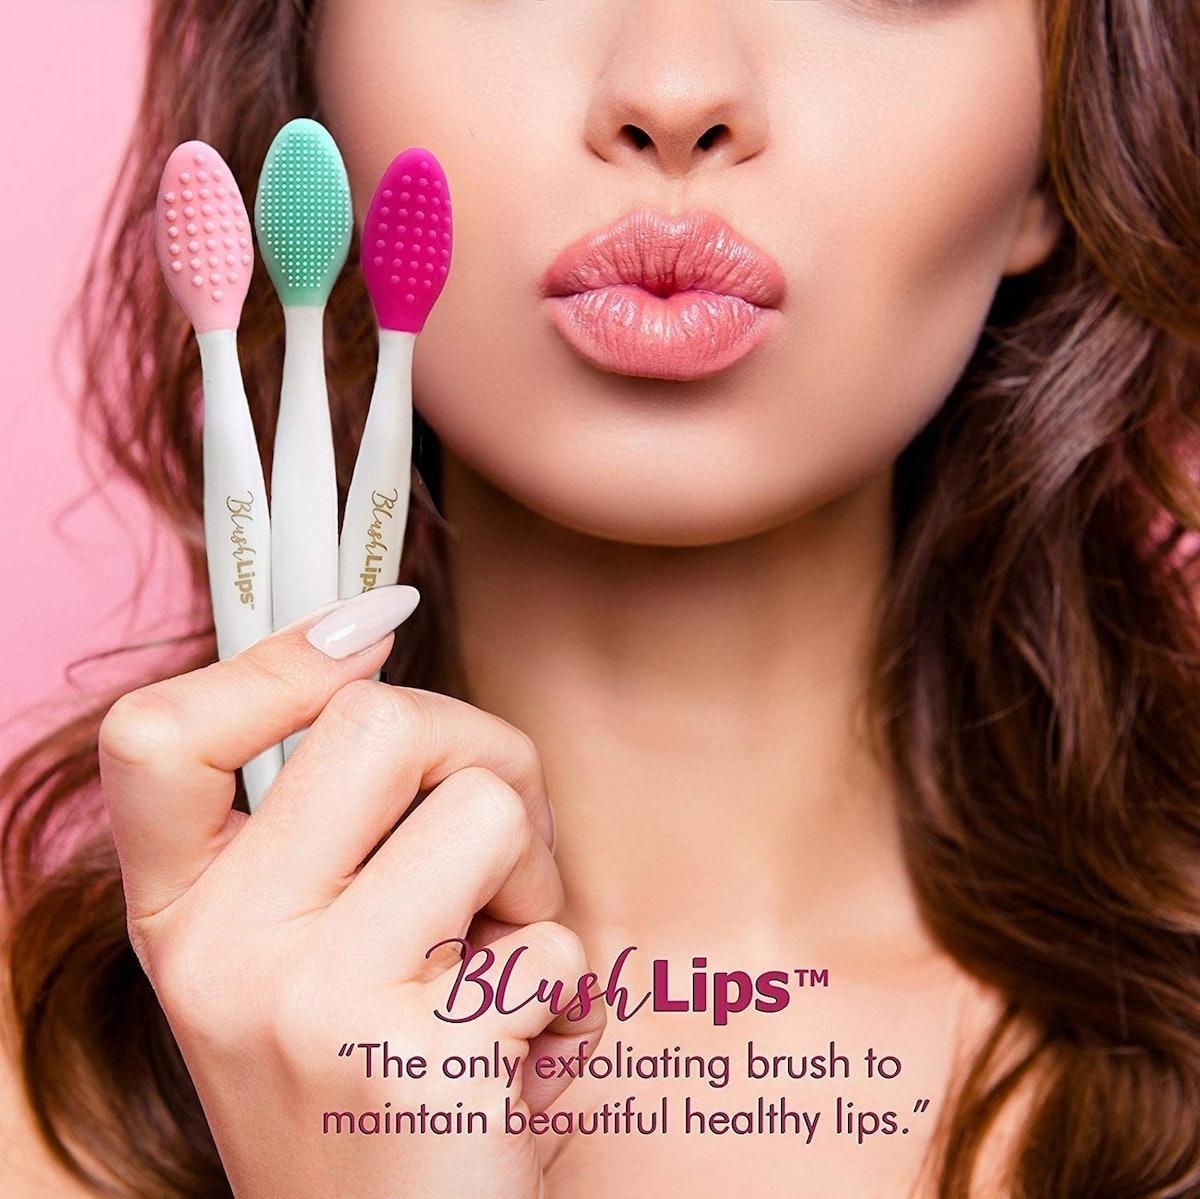 BlushLips Exfoliating Lip Brush